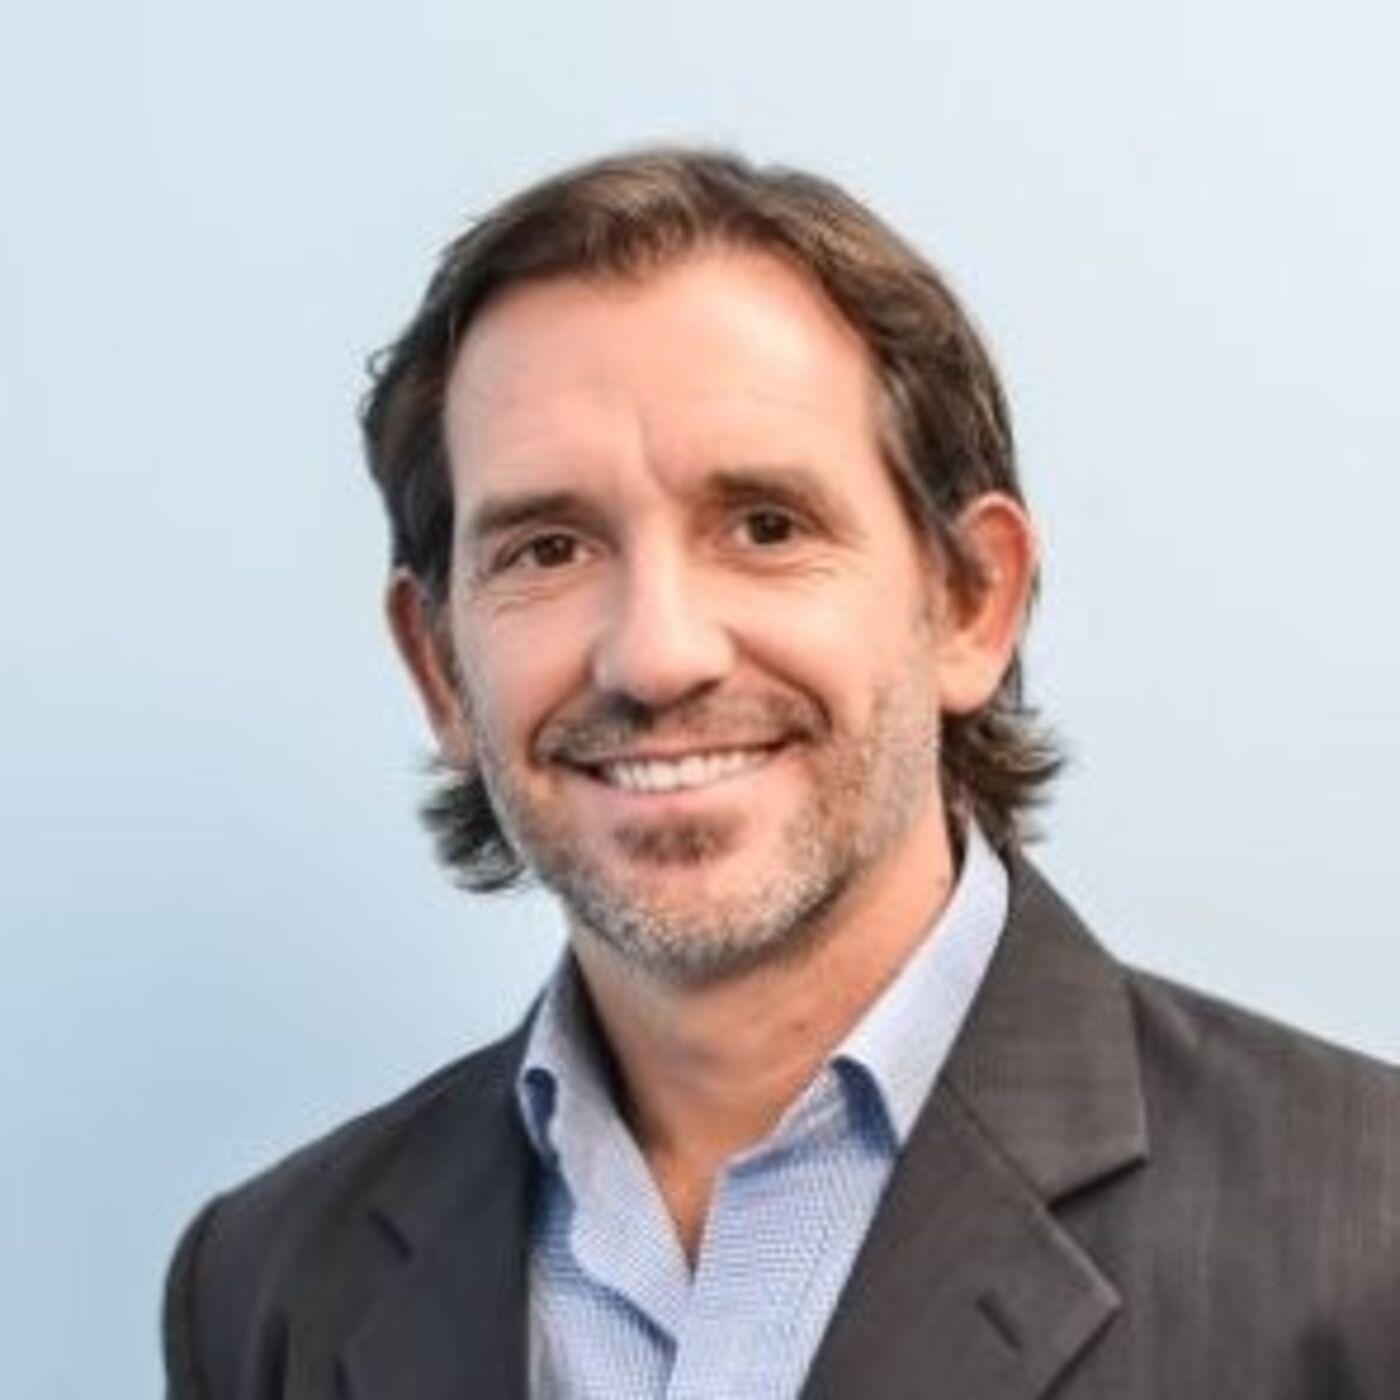 #11: Hernan Muntaner, President and CEO at Grupo Rey, Panama